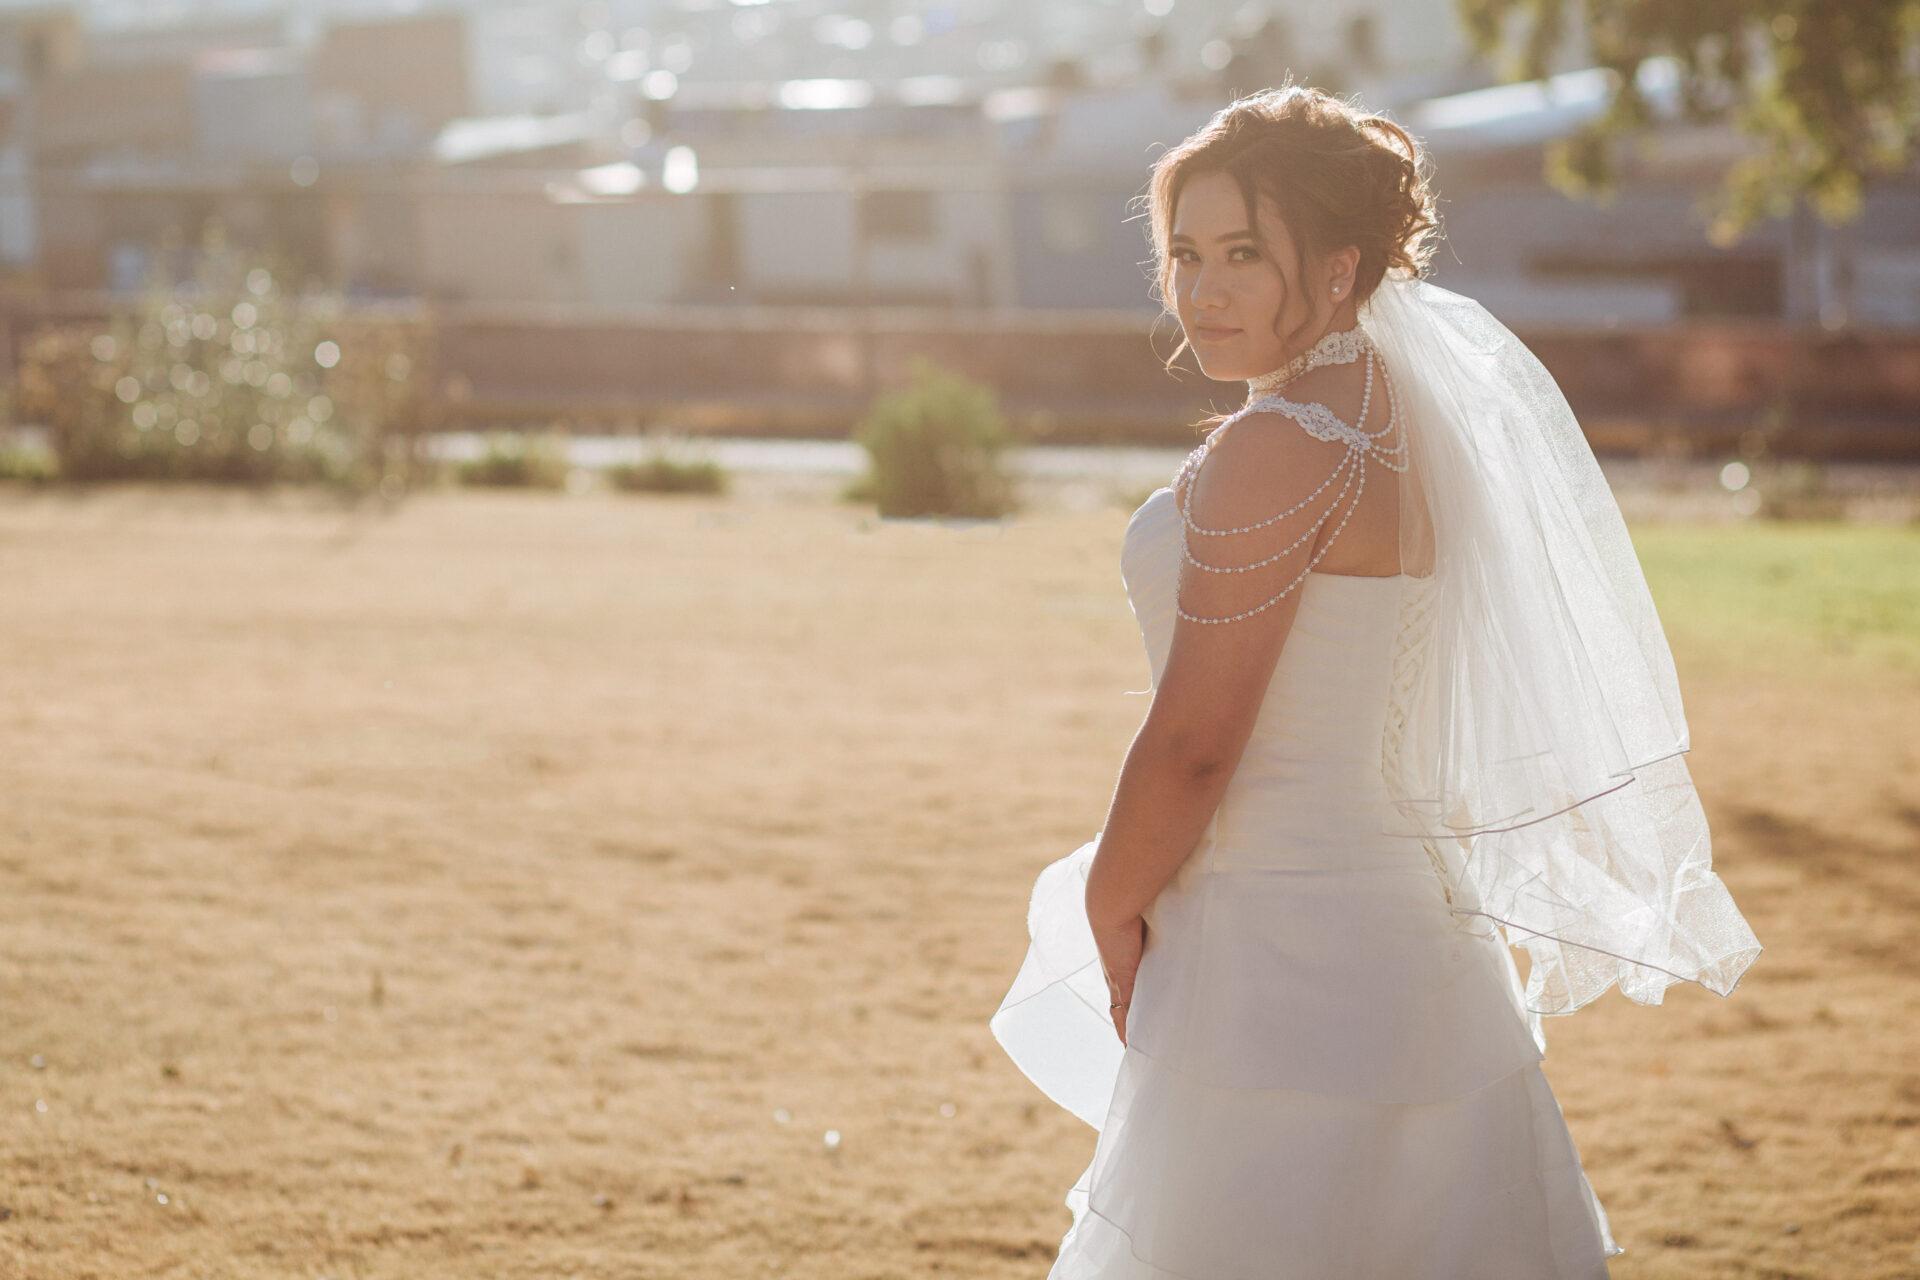 javier_noriega_fotografo_bodas_gaviones_zacatecas_wedding_photographer15